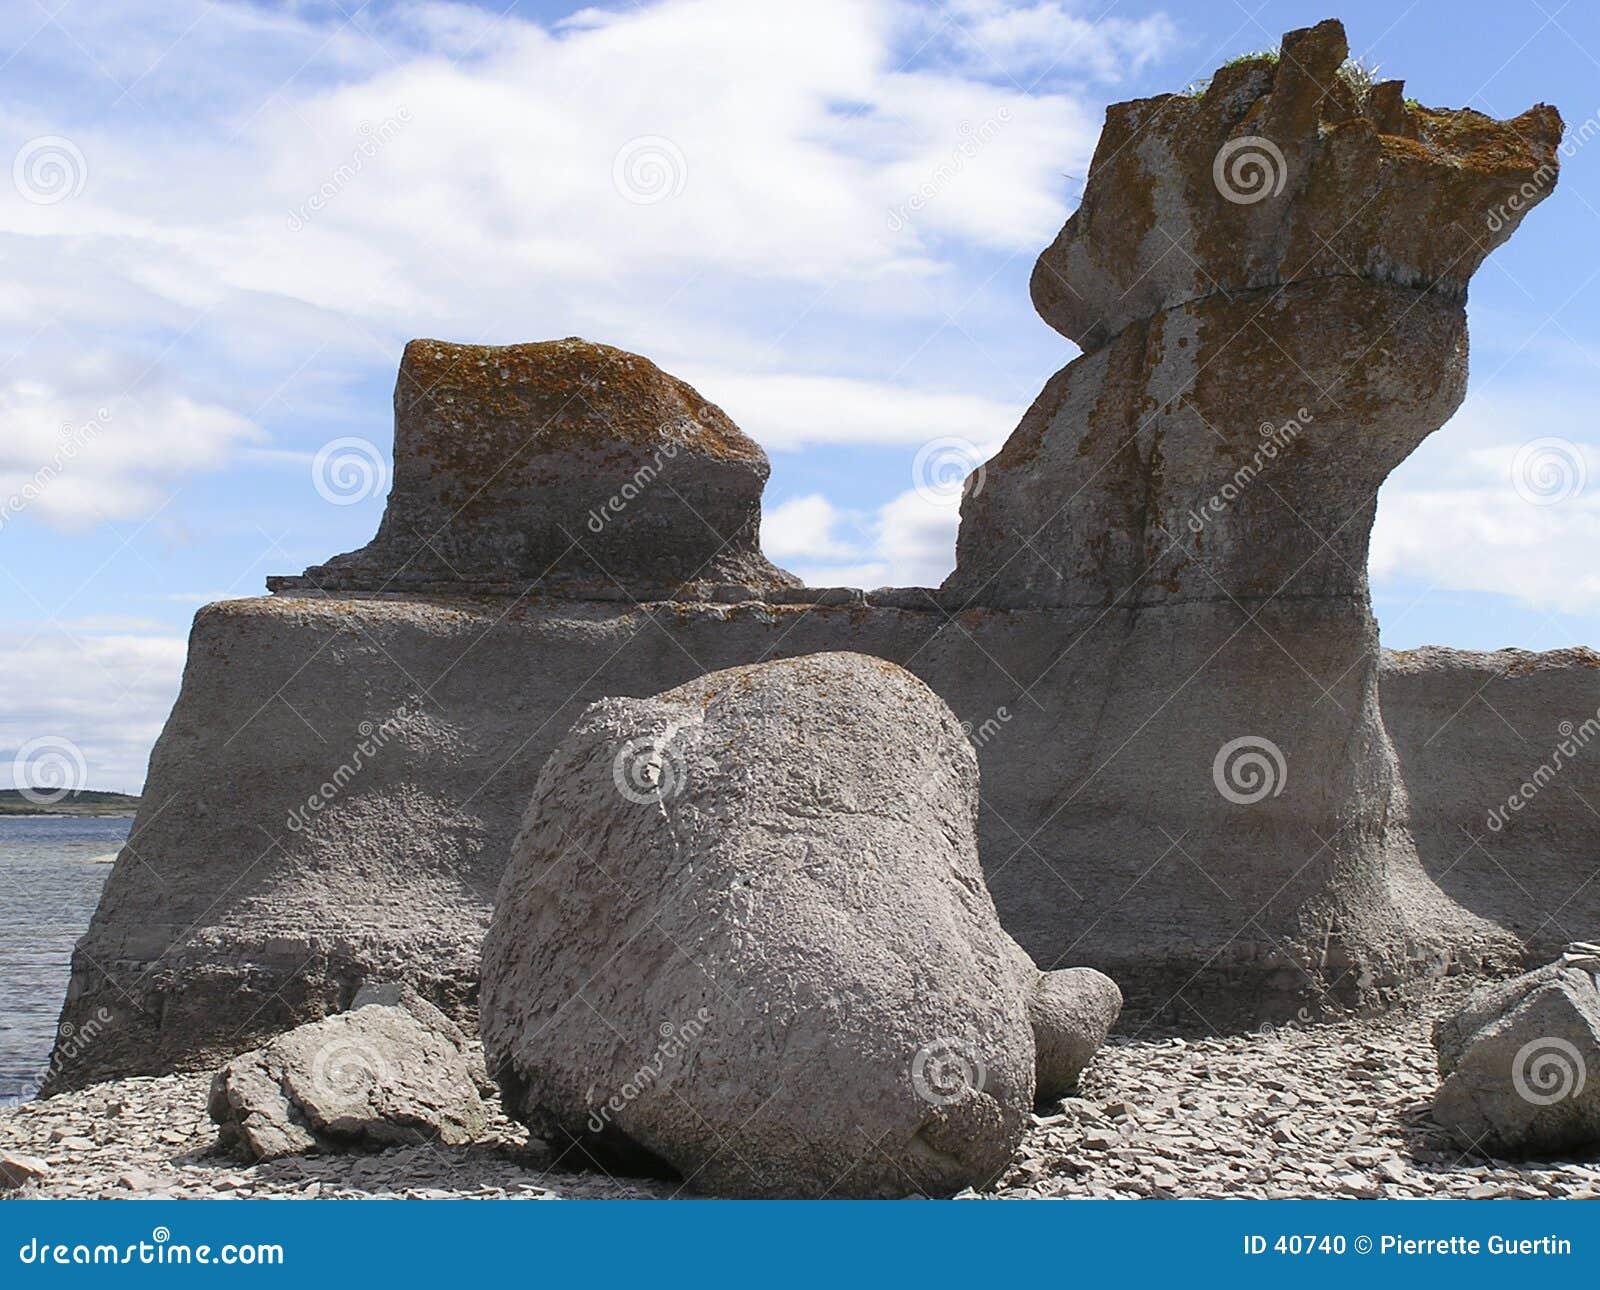 fallen granite stones